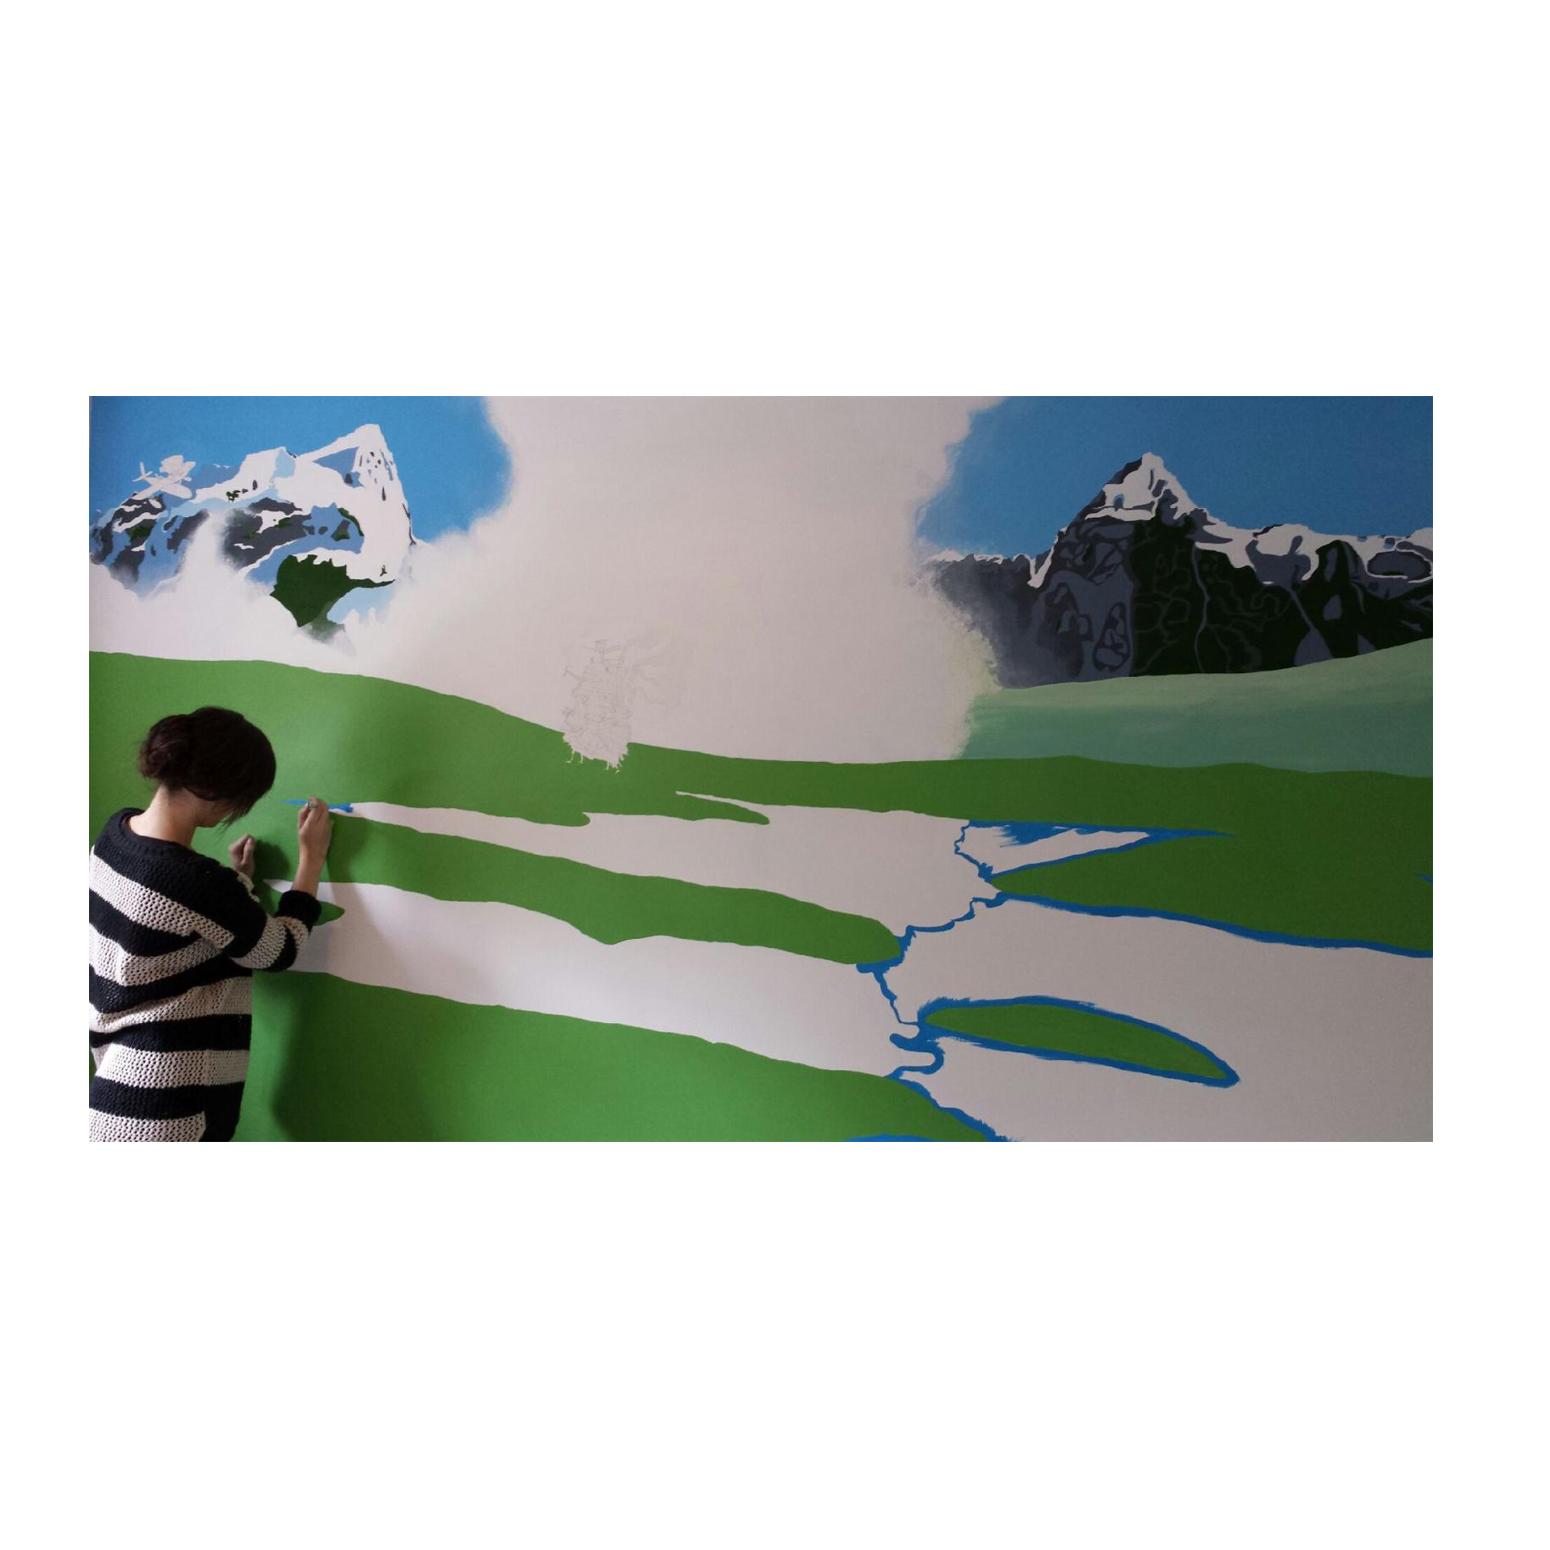 Mural painter bio go daddy.jpg